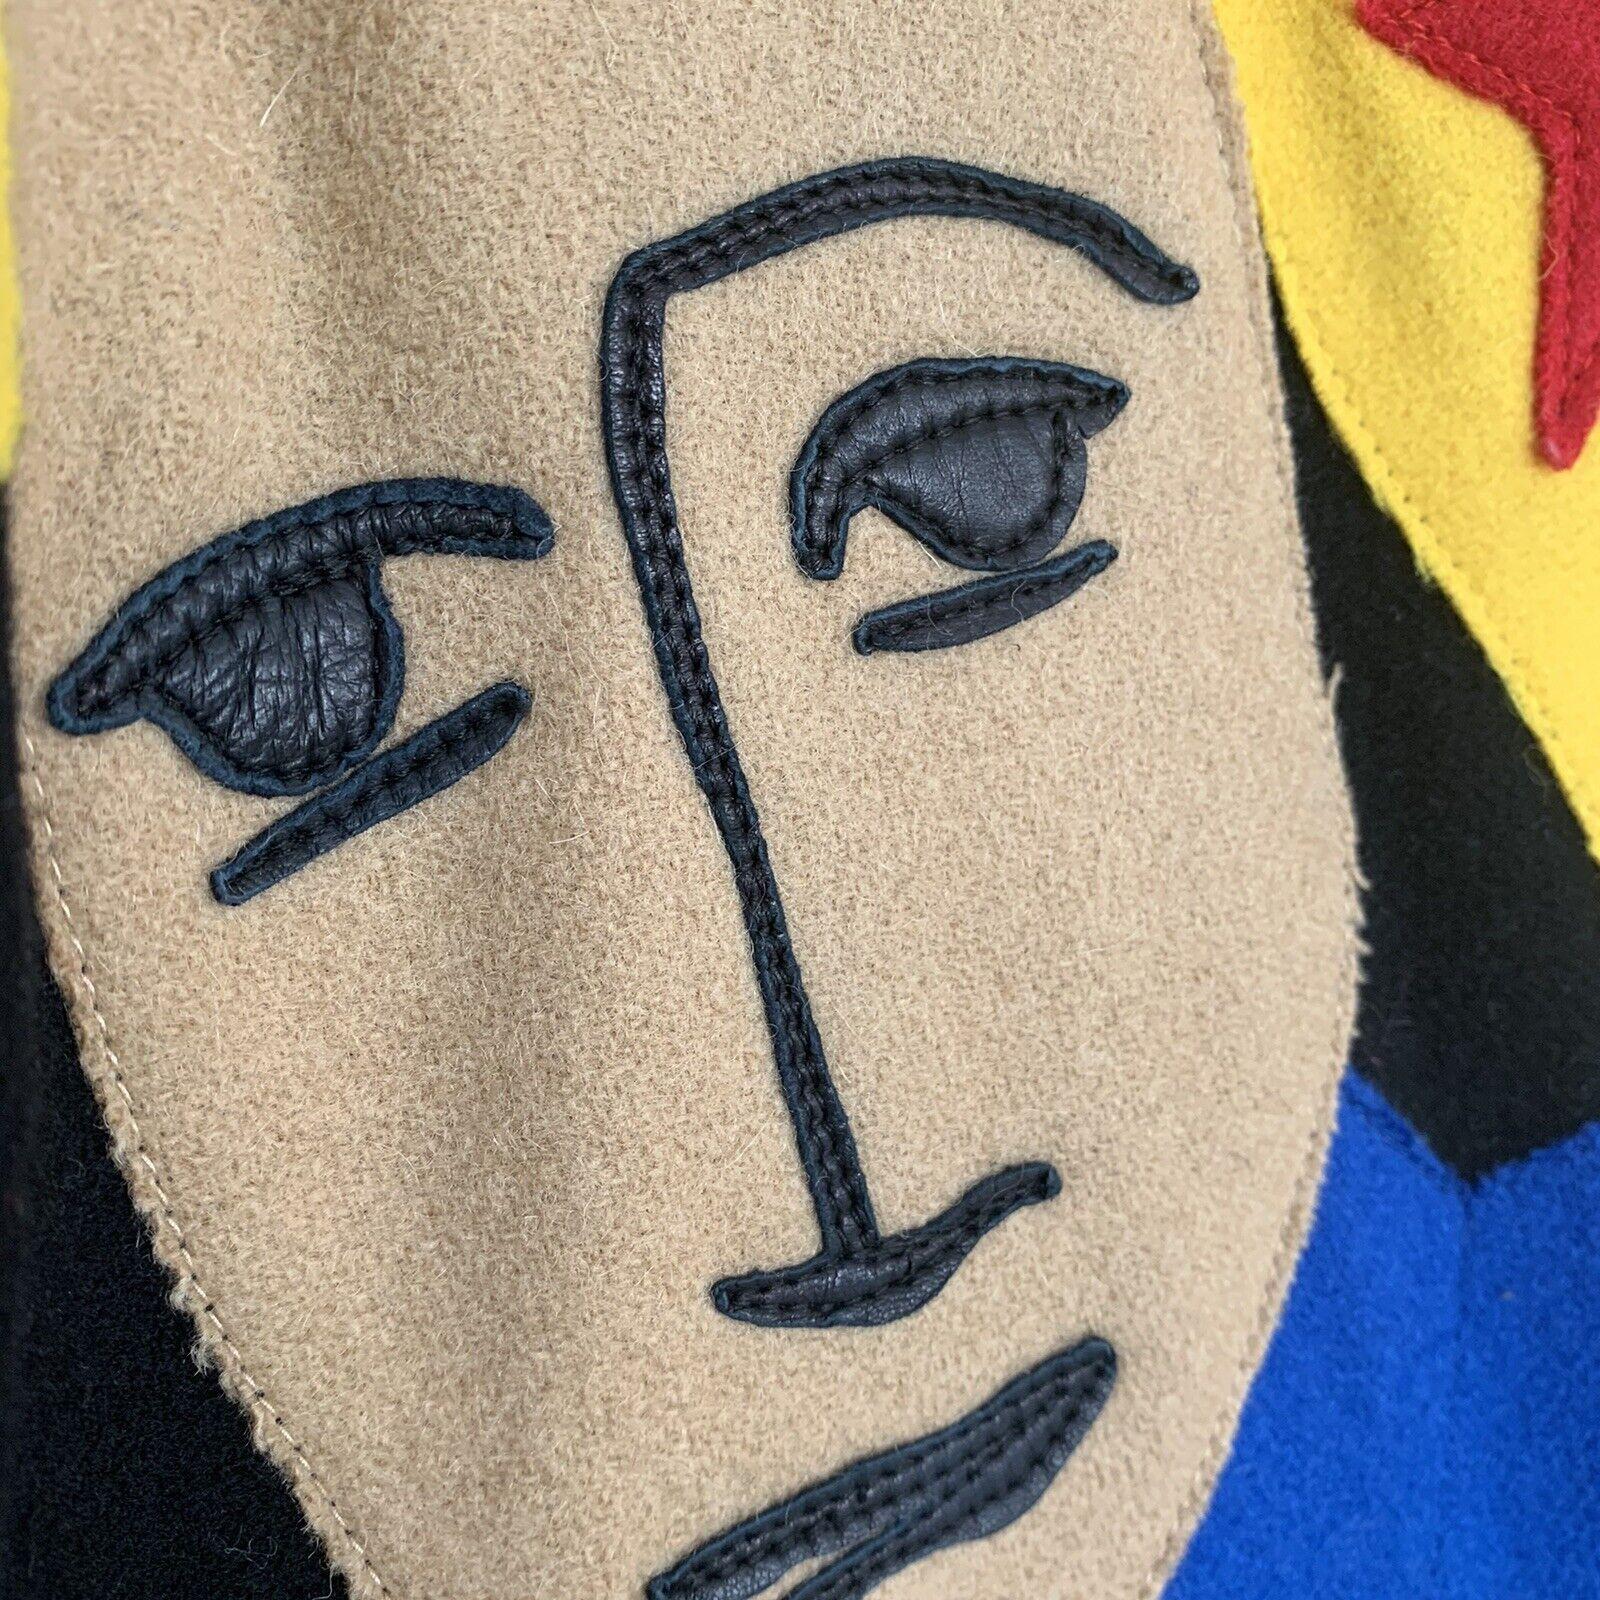 Jean Charles de Castelbajac KO and CO Wool Coat - image 5